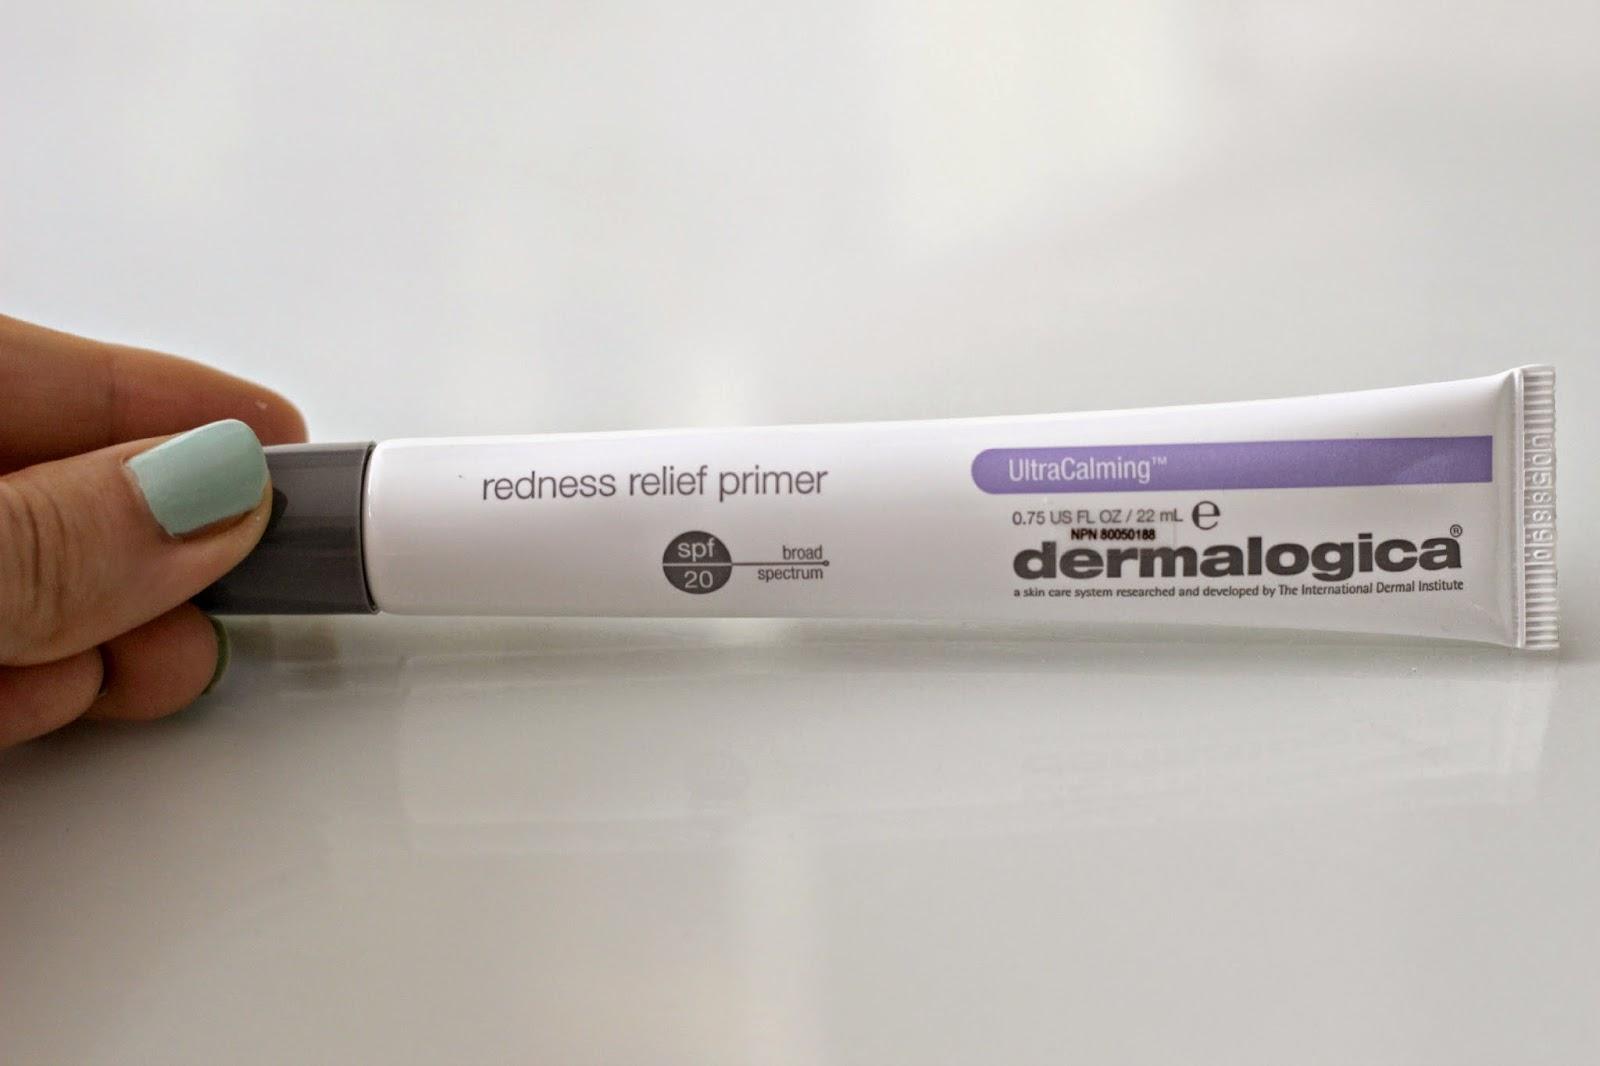 New Dermalogica Powerbright Trx Treatment Kit And Redness